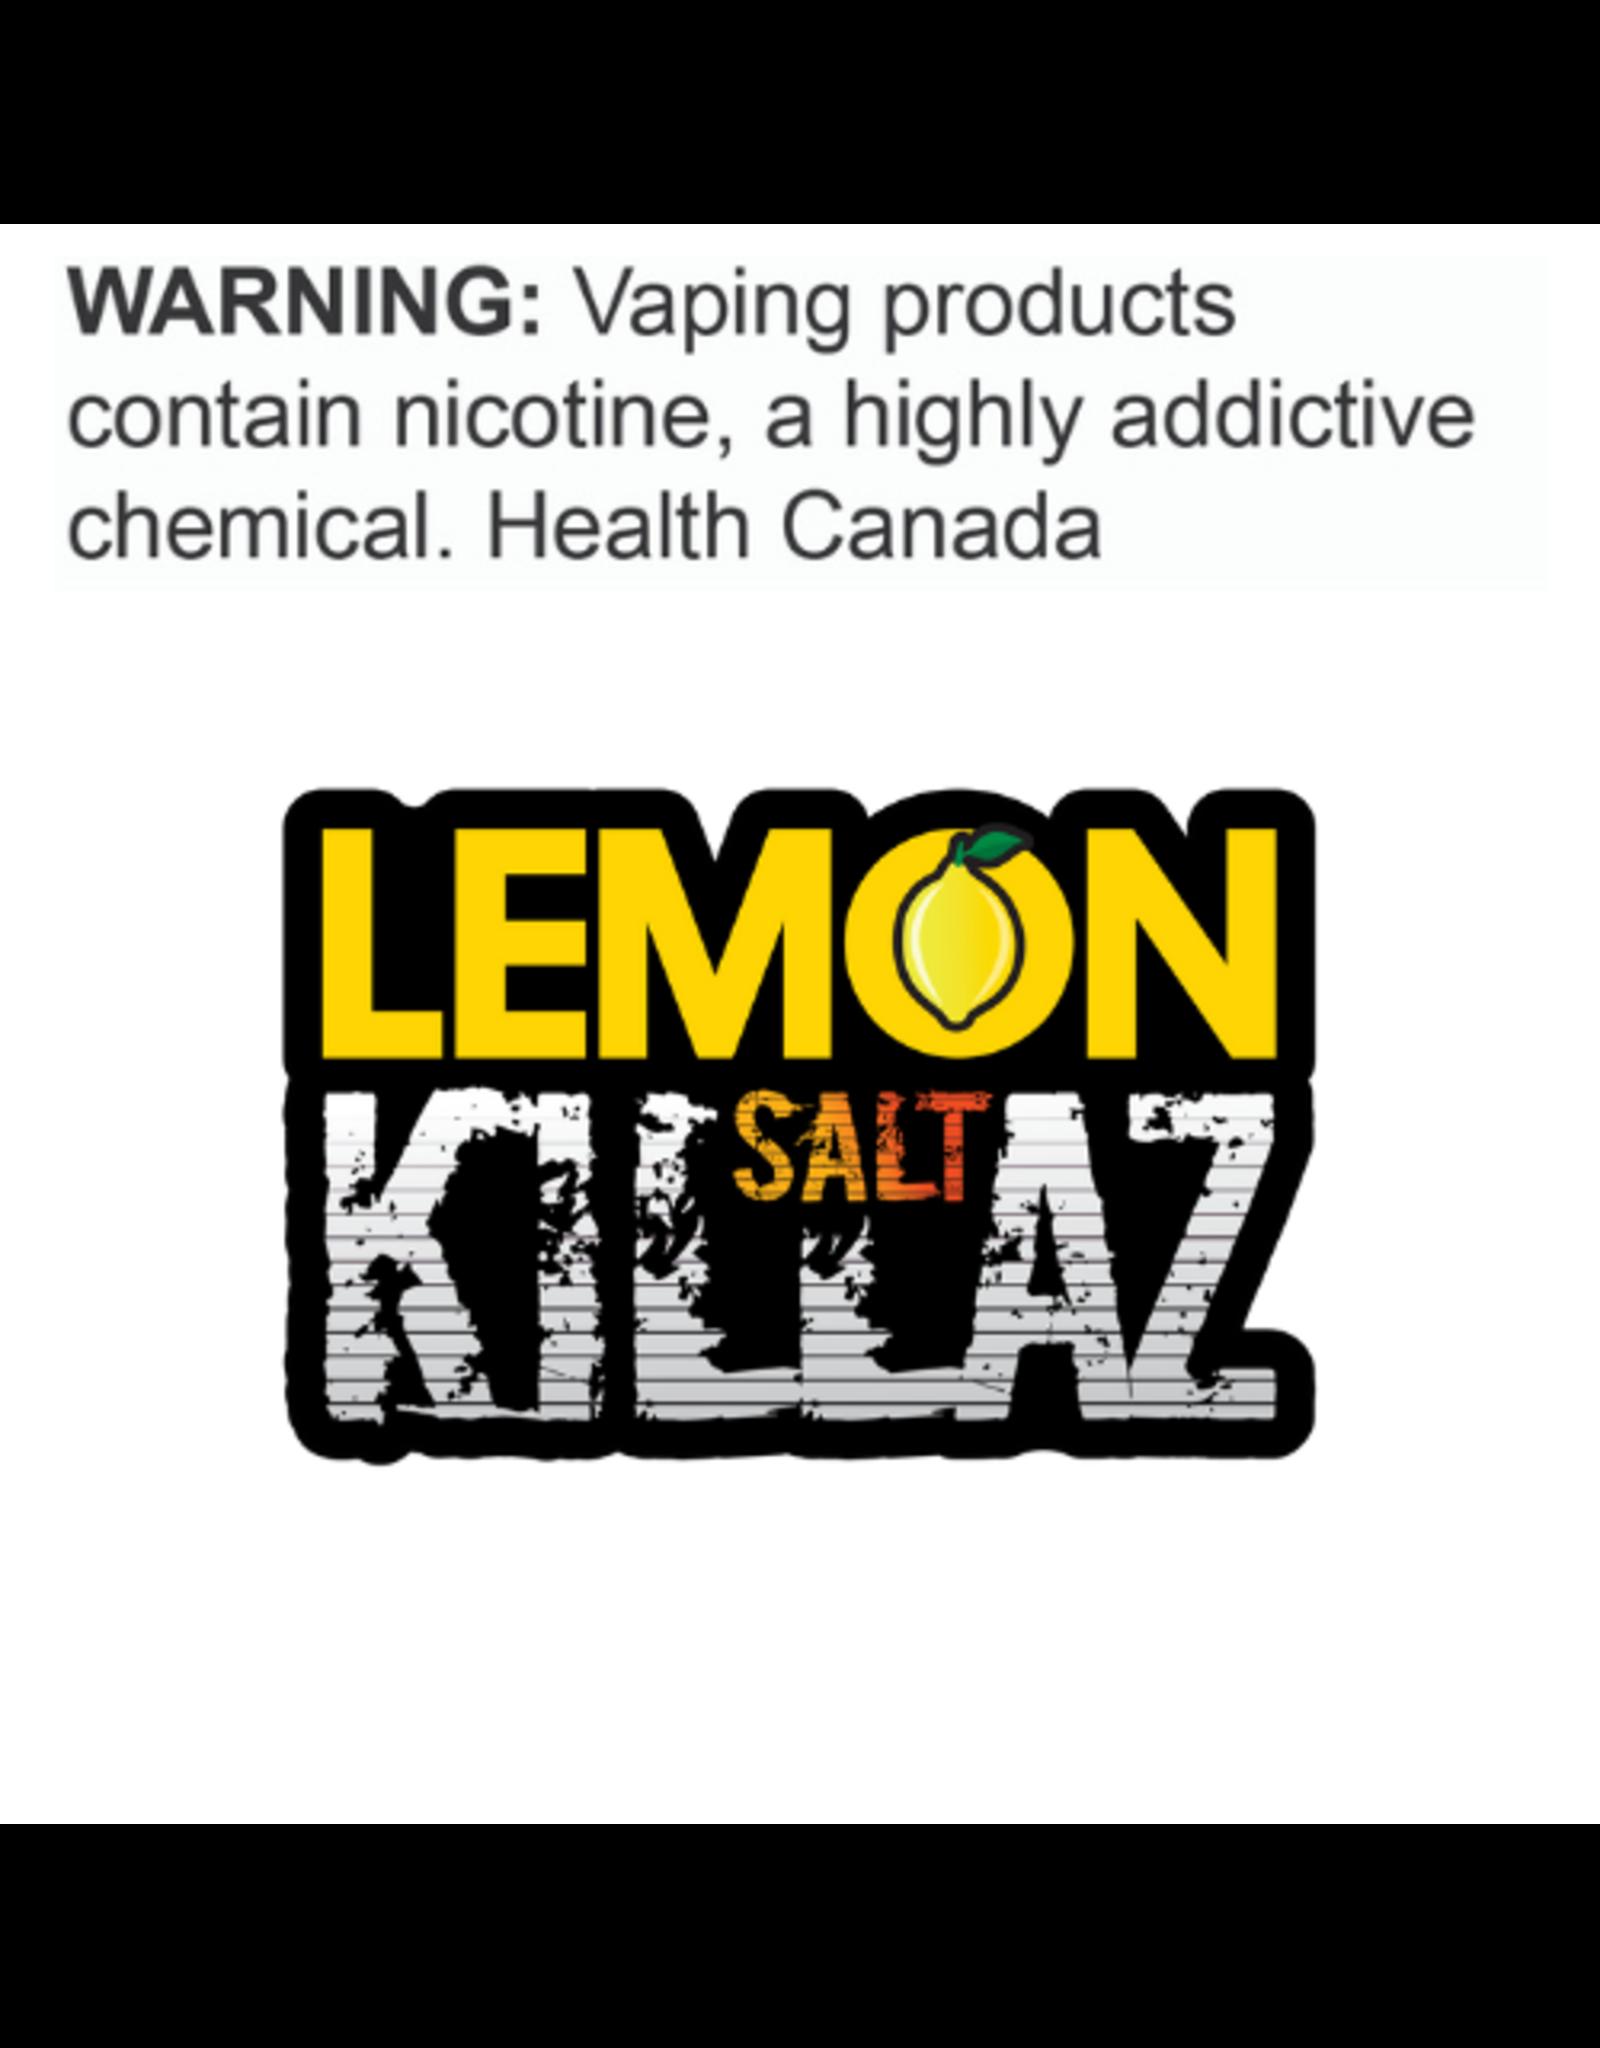 Lemon Killaz Lemon Killaz Salt